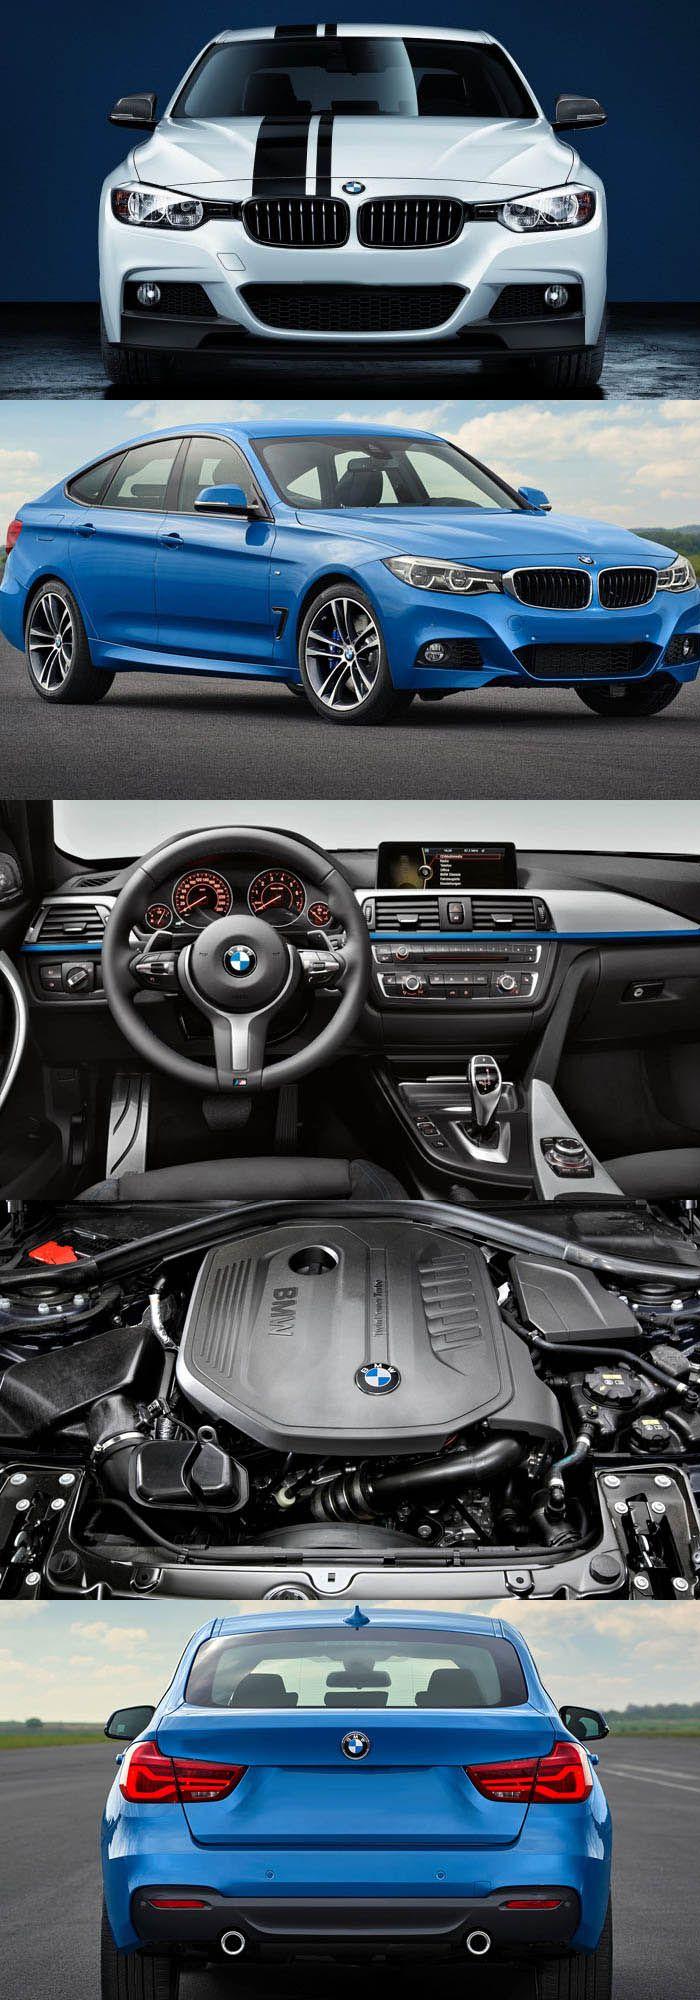 BMW 318i Review #BMW #BMW3Series #3SeriesReview For more read: https://sites.google.com/site/bestautoengines/latest-articles/bmw-318i-review